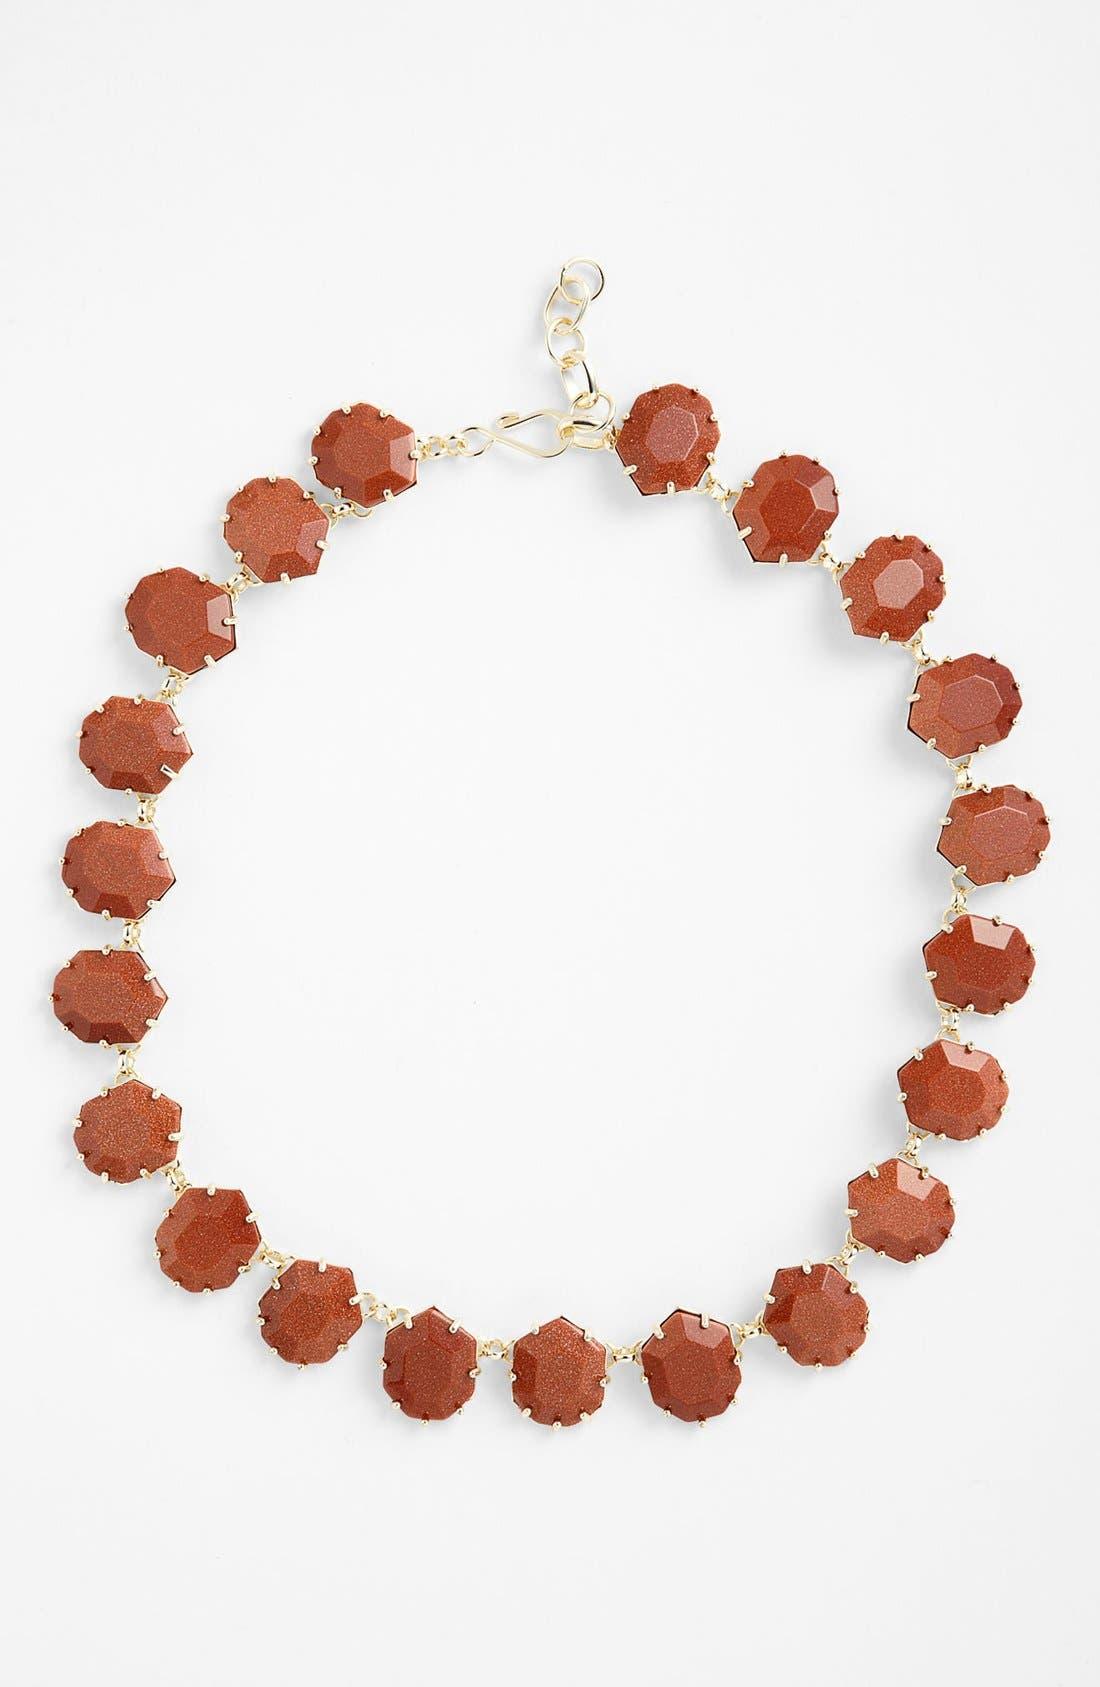 Alternate Image 1 Selected - Kendra Scott 'Sam' Stone Necklace